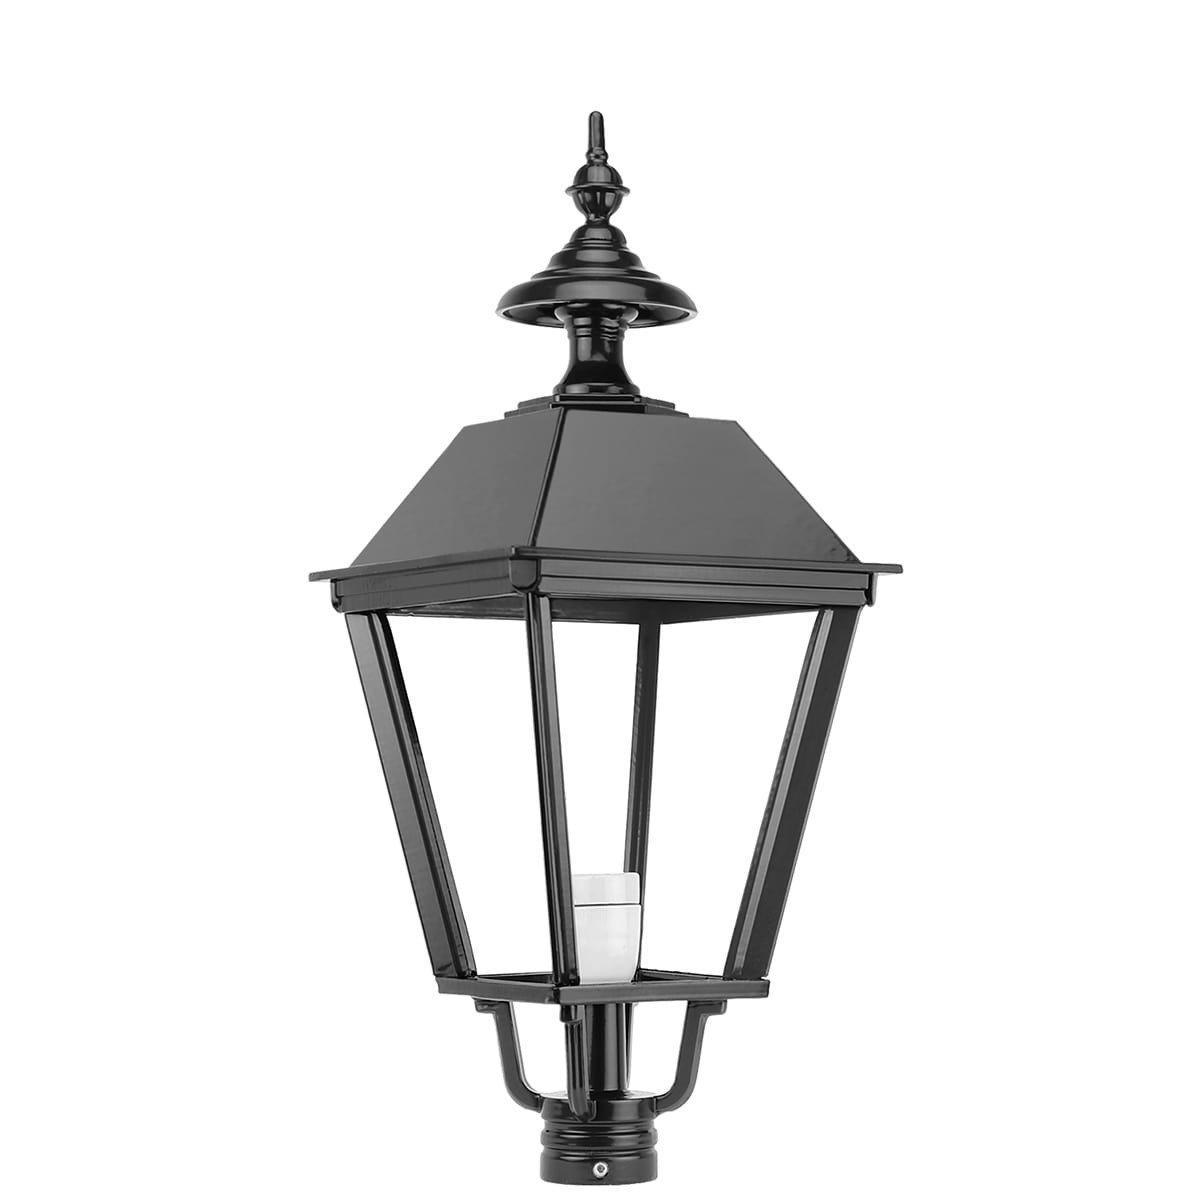 Outdoor lighting Classic Rural Loose lampshade K04 - 52 cm